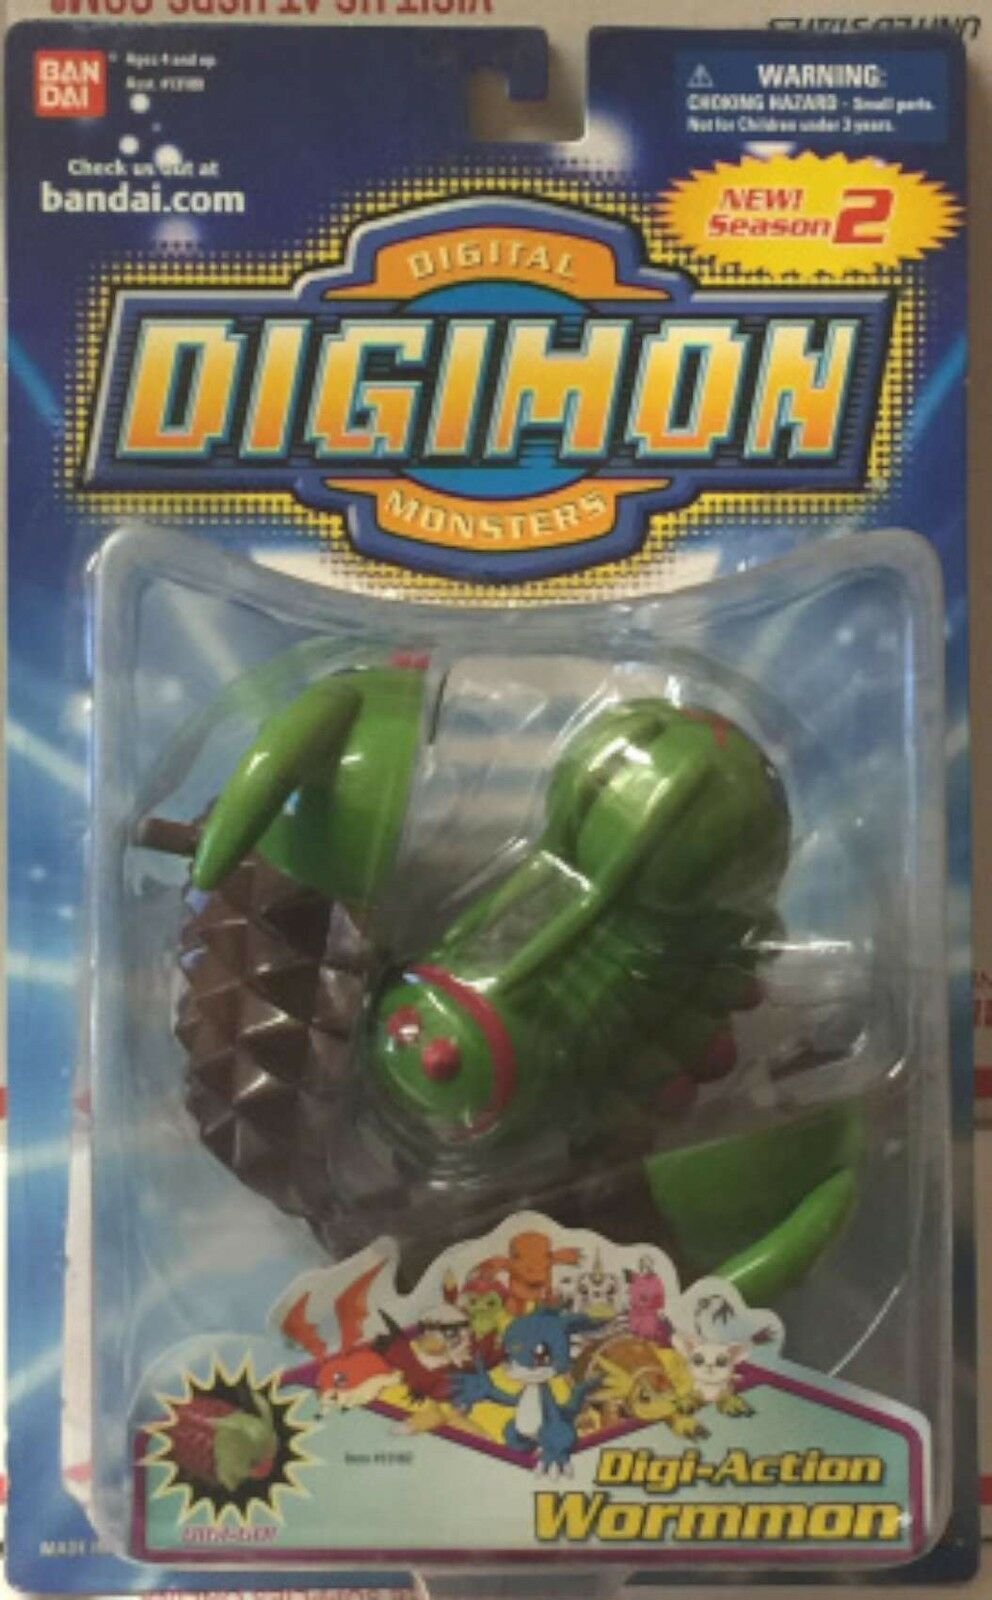 DIGIMON SEASON 2 DIGI-ACTION WORMMON New New New ebbd39